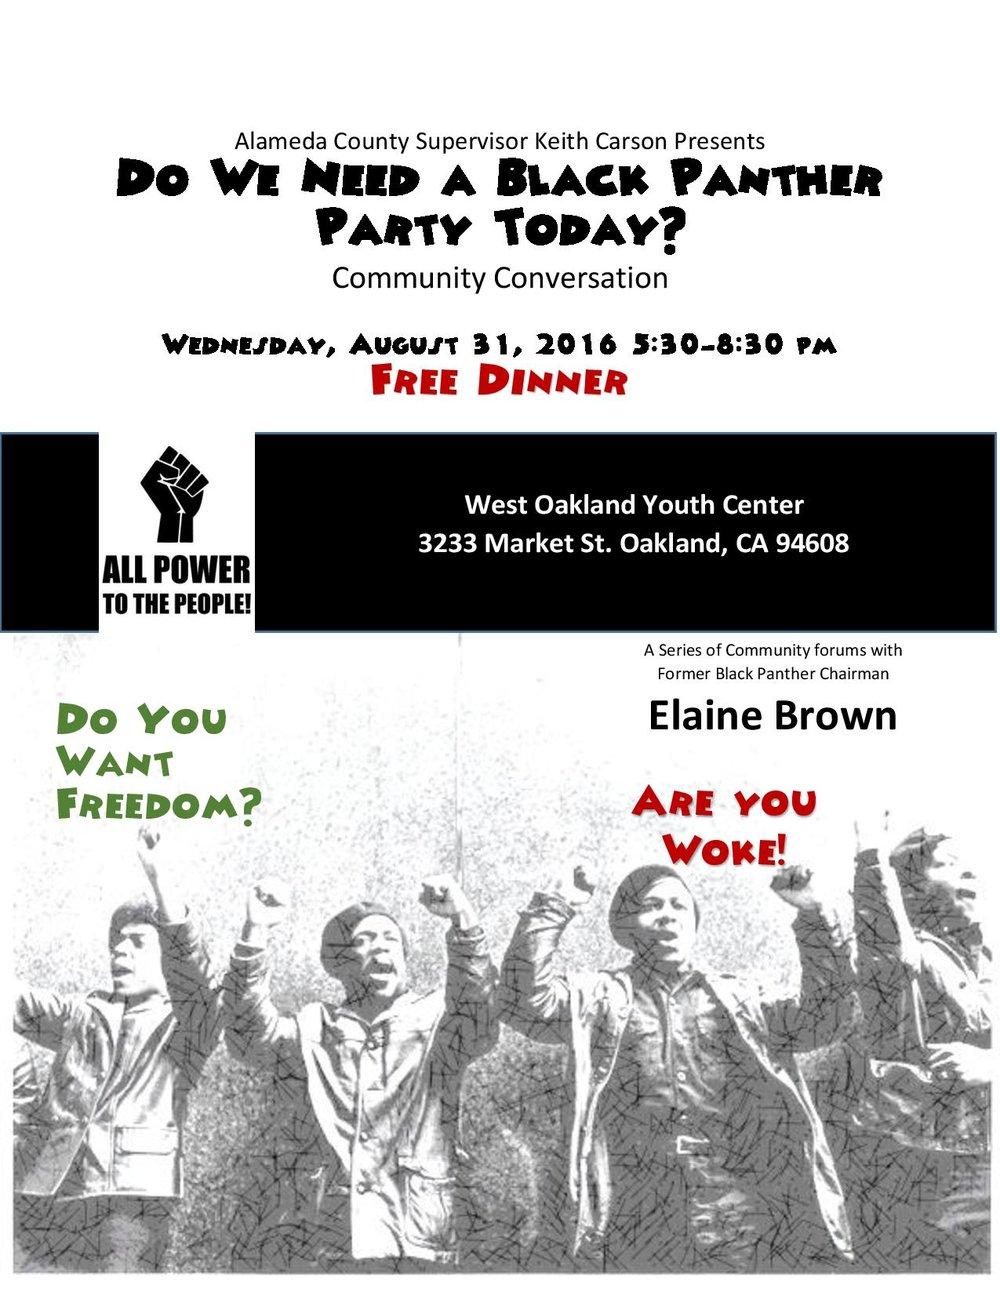 Community Forum Flyer.jpg